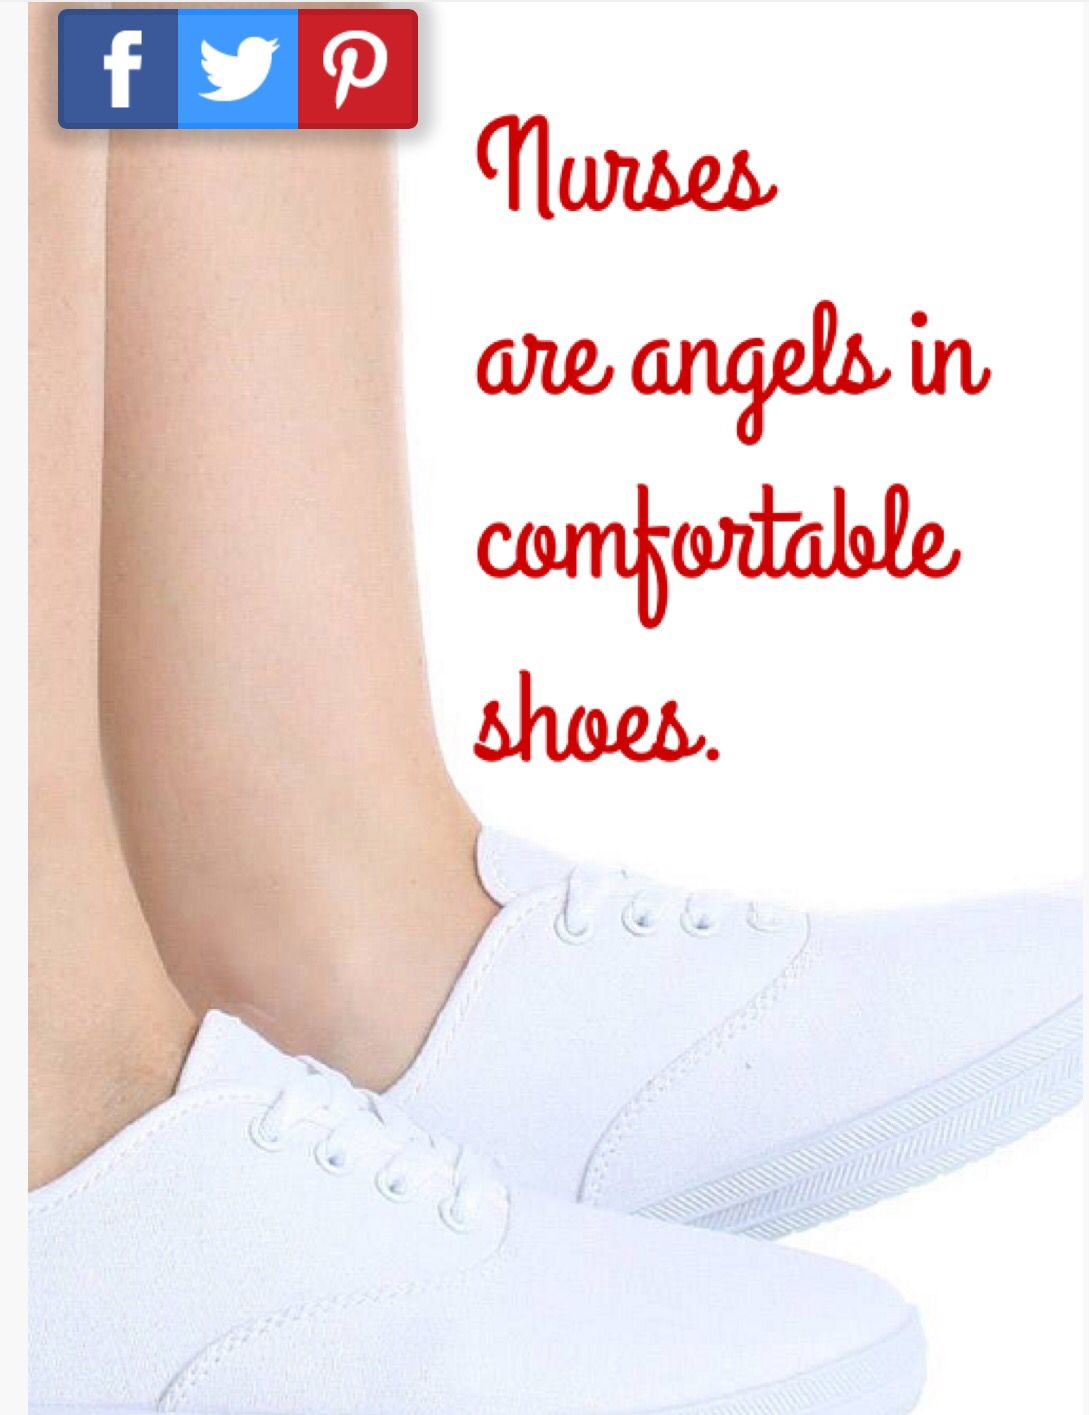 Nurse Nurse quotes, Nursing school prerequisites